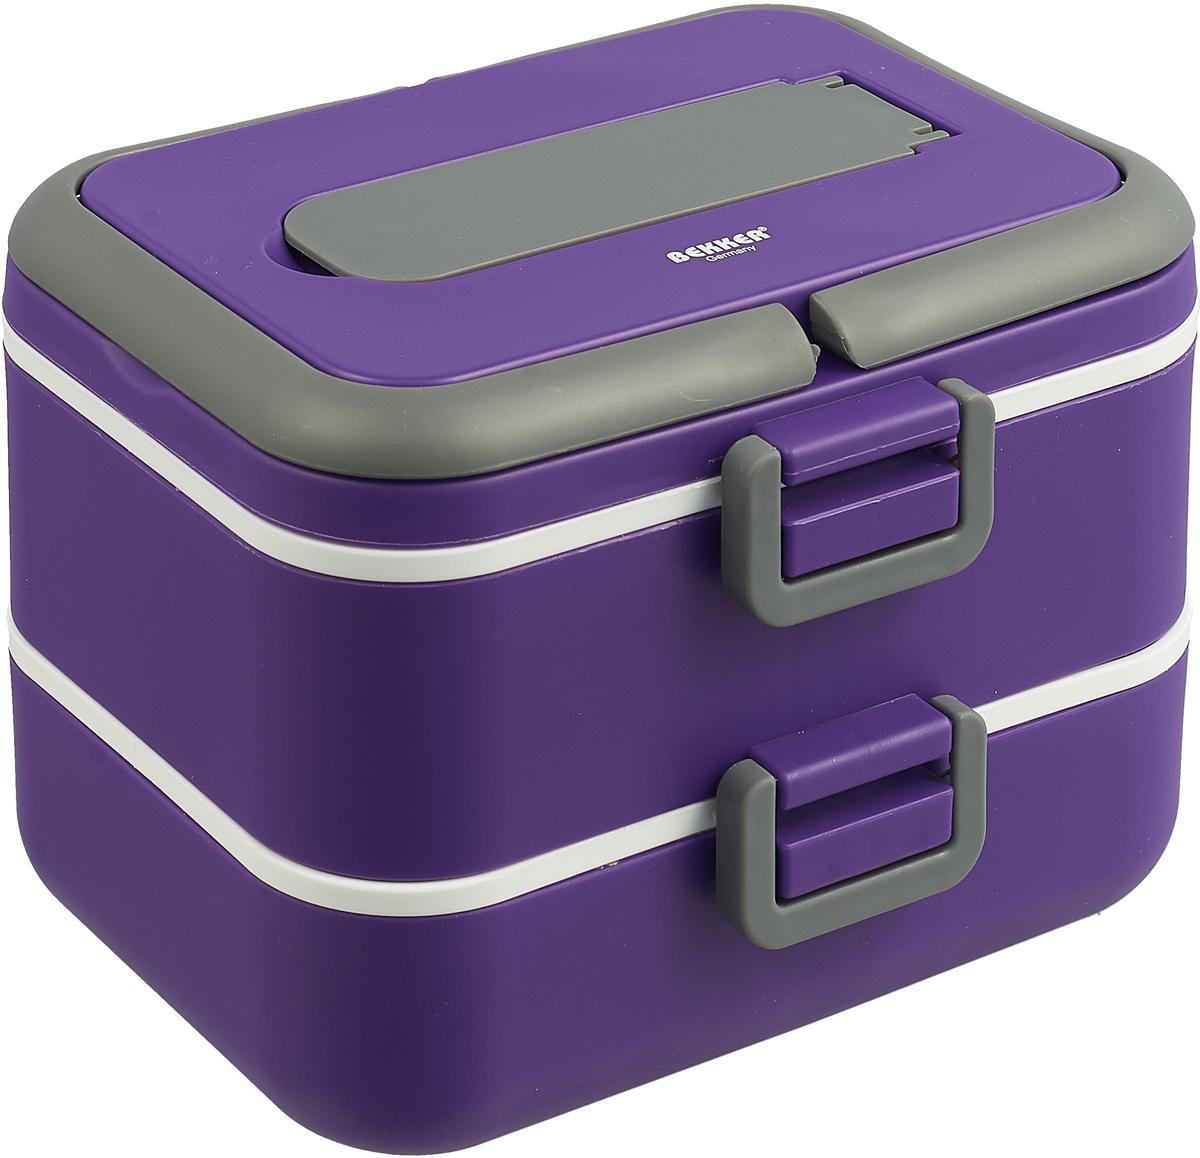 Контейнер пищевой Bekker, BK-4366, фиолетовый, 750 мл контейнер 2 28л bekker bk 5108